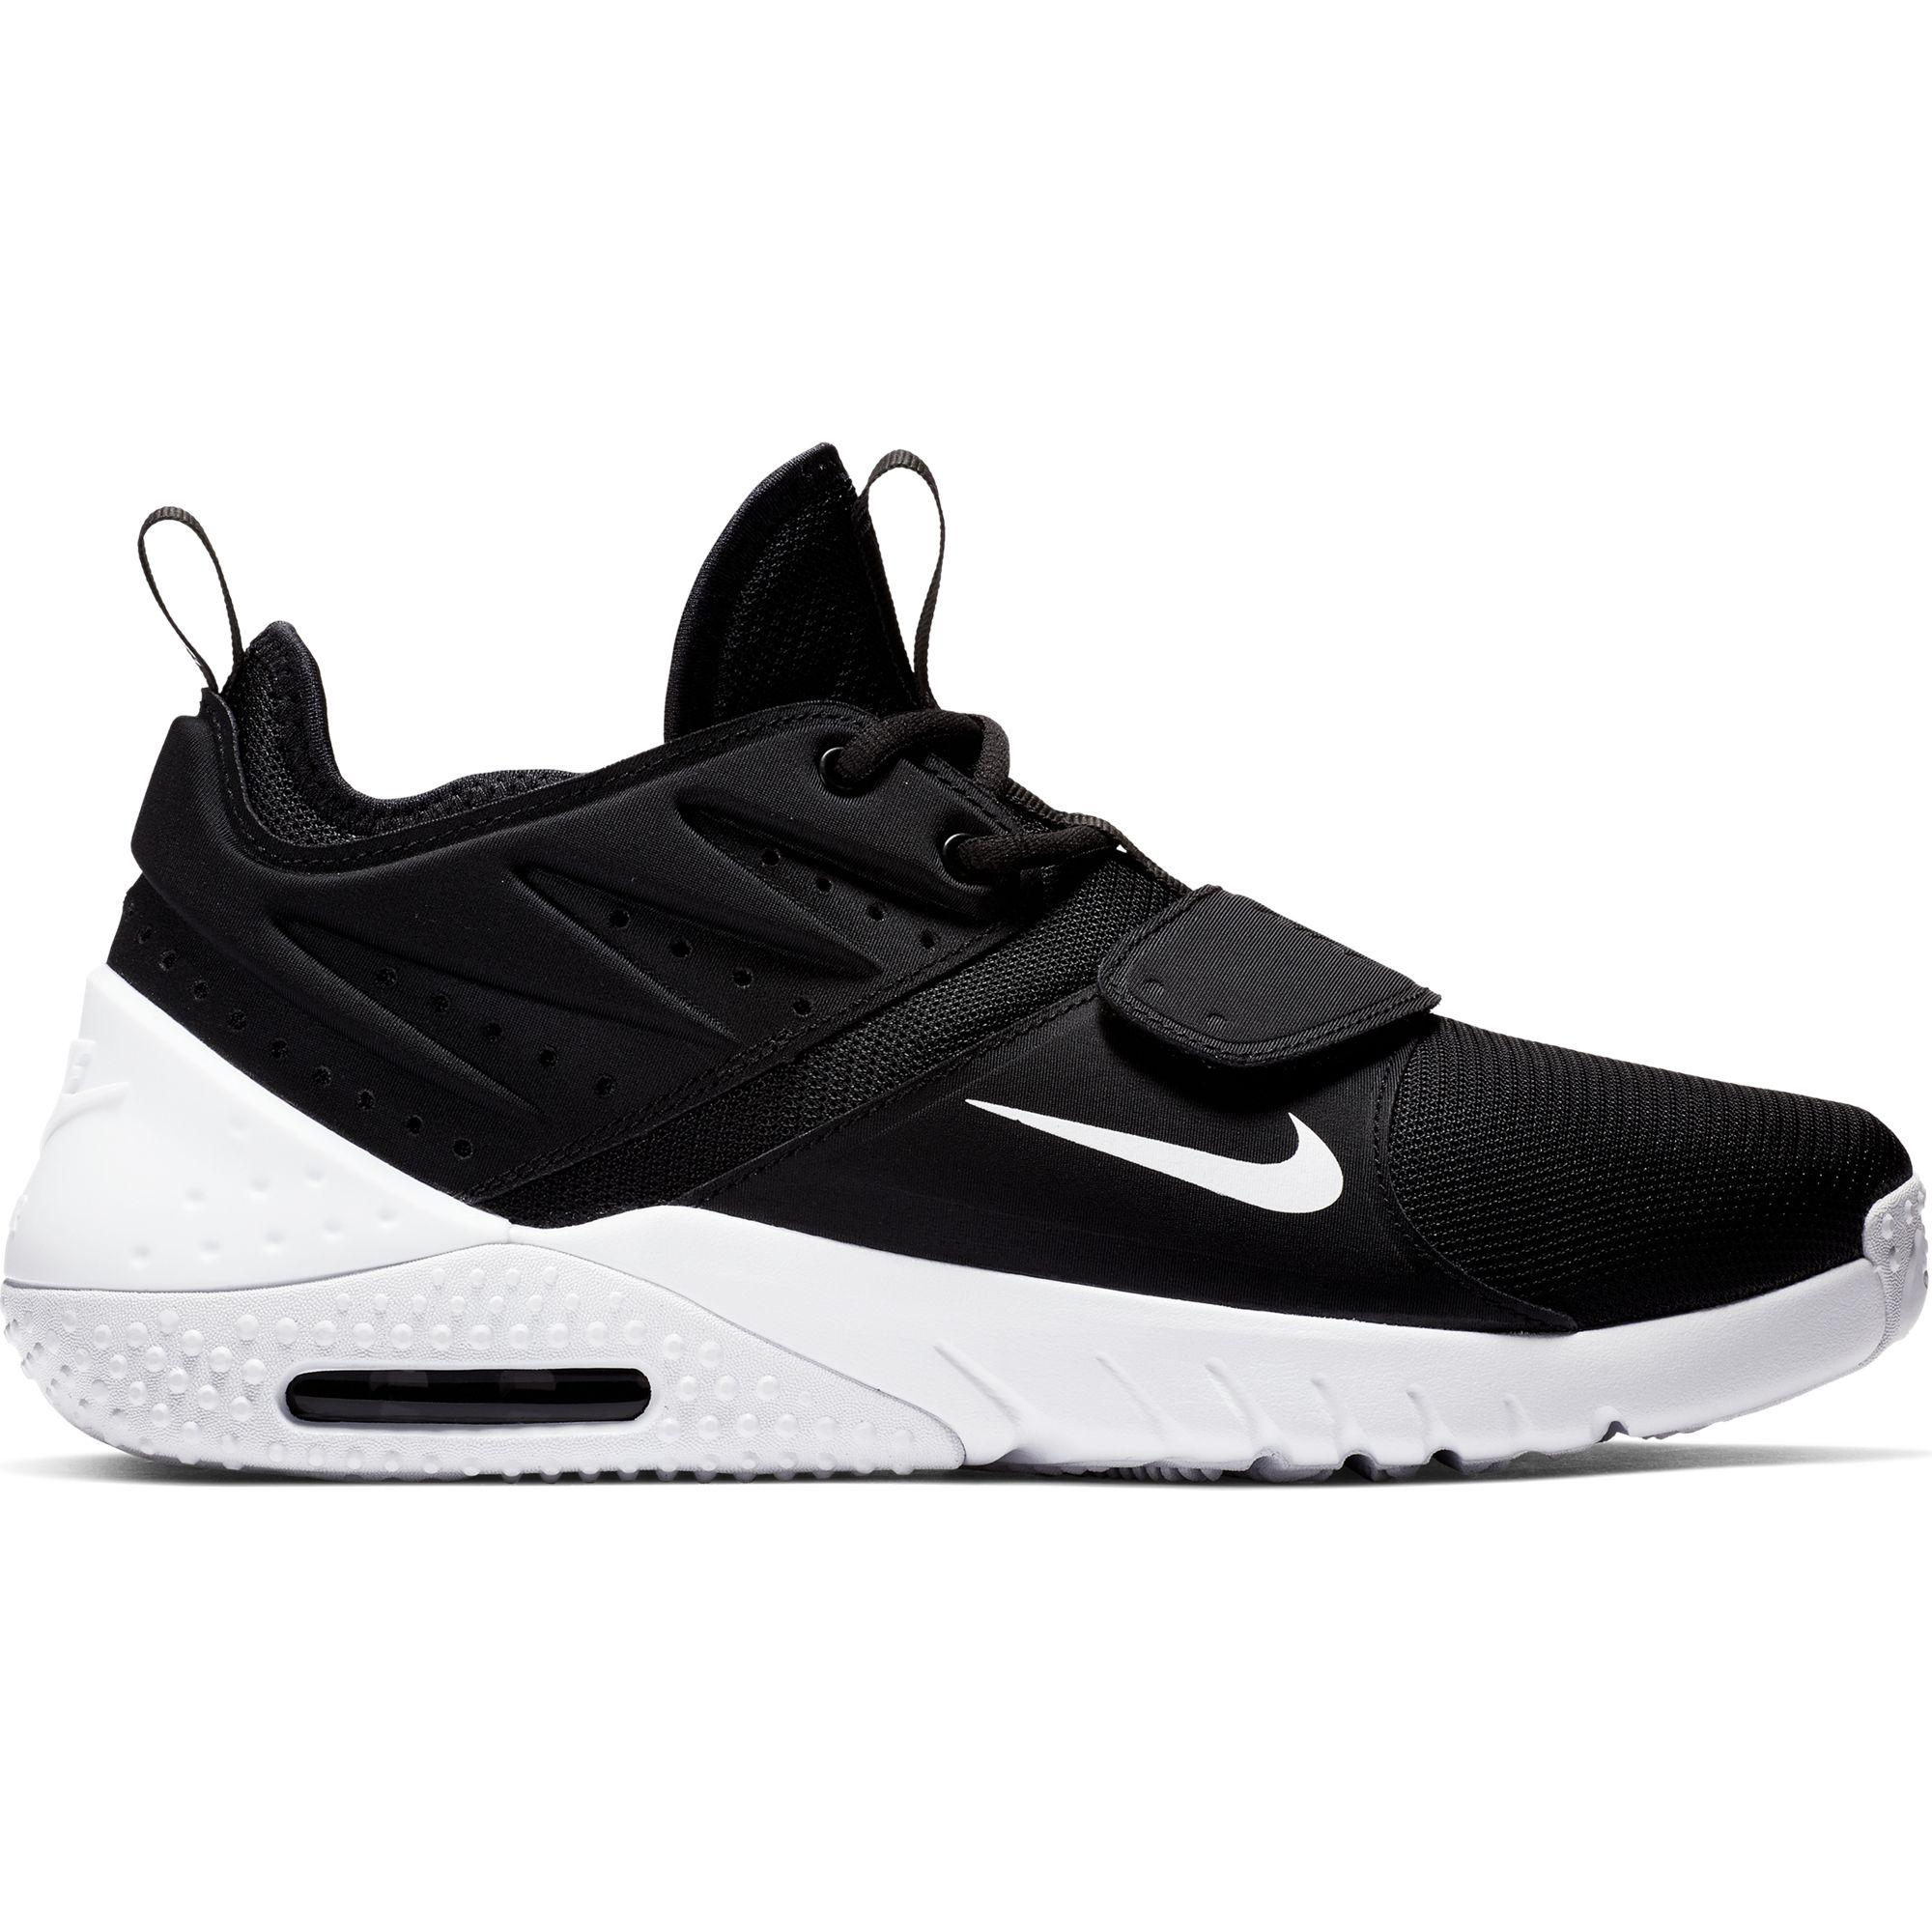 af50377eb64 Nike Men's Air Max Trainer 1 Training Shoes, Black/White US 8.5